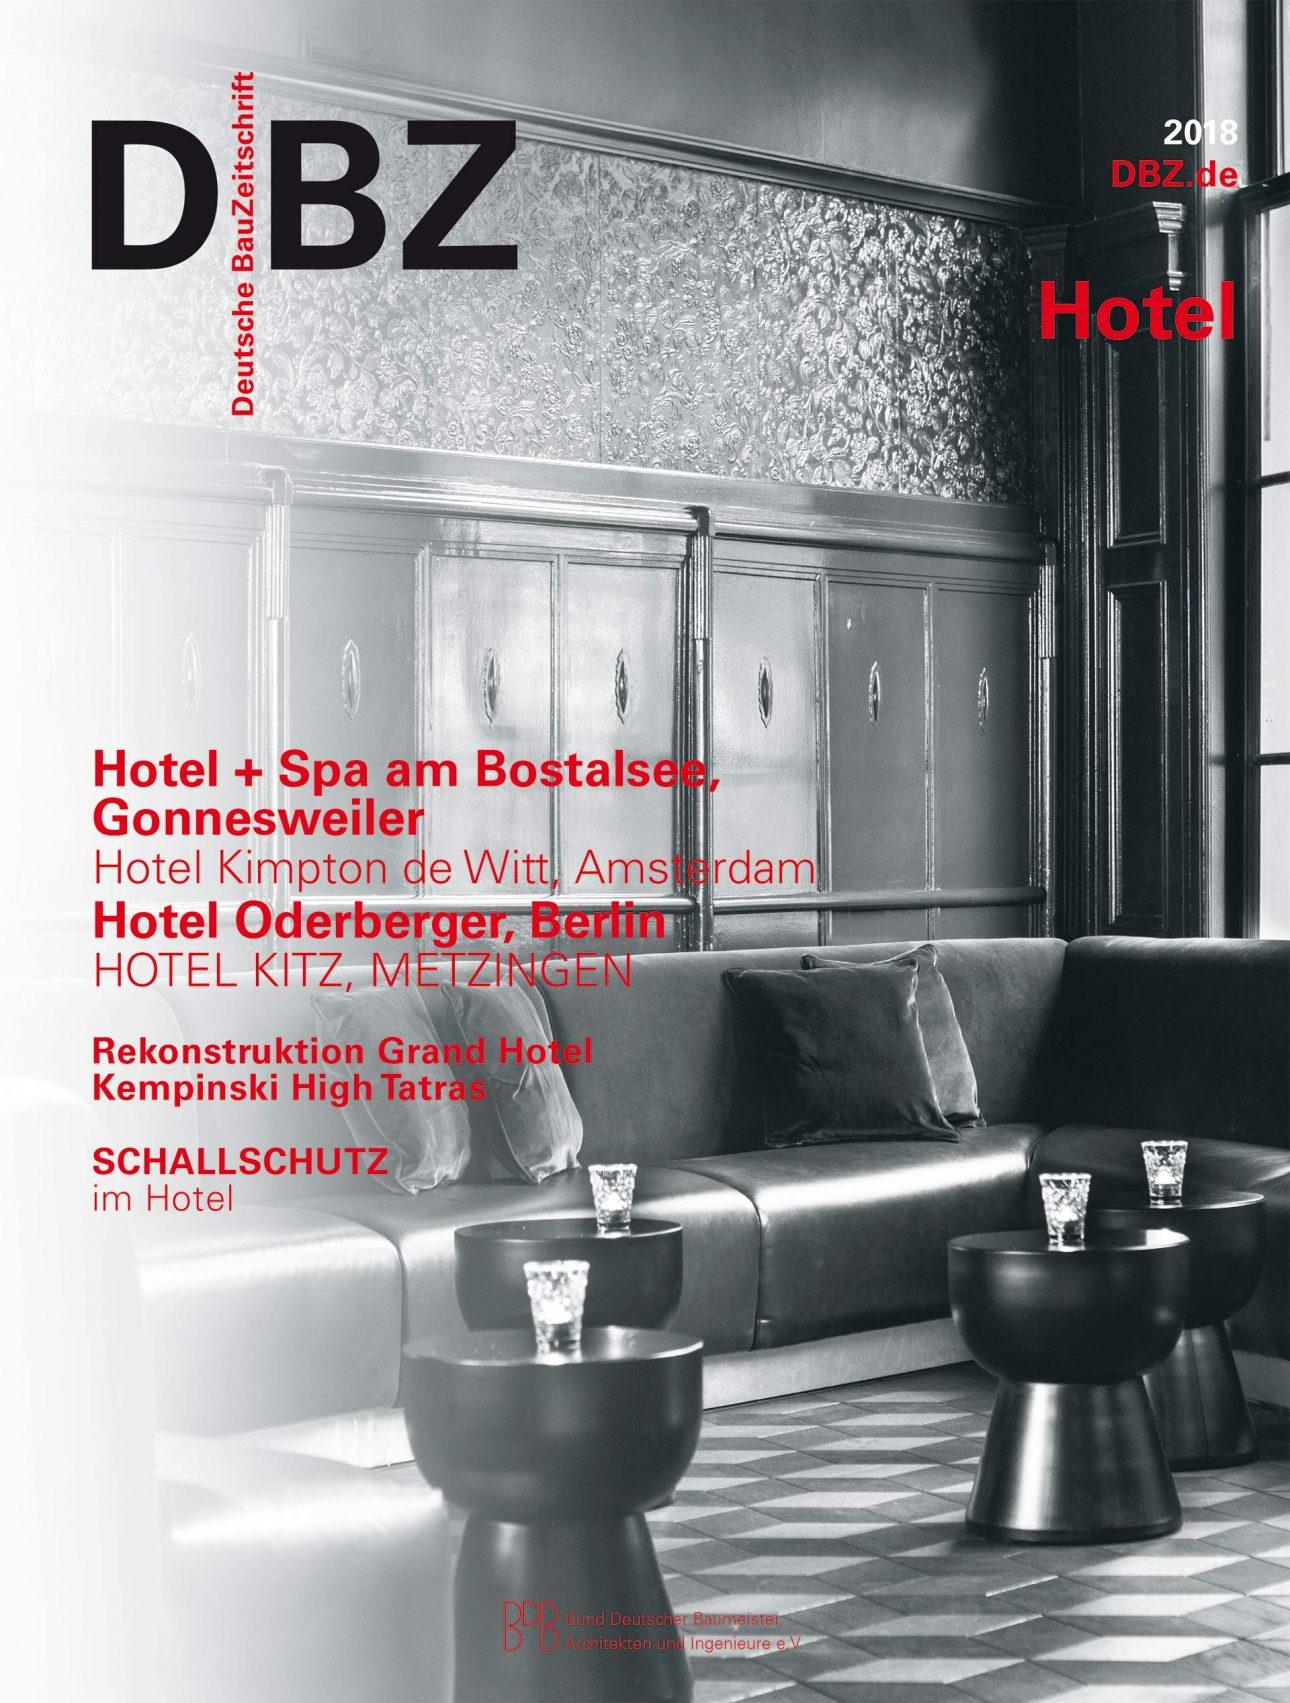 DBZ Sonderheft Hotel 2018 Titelblatt